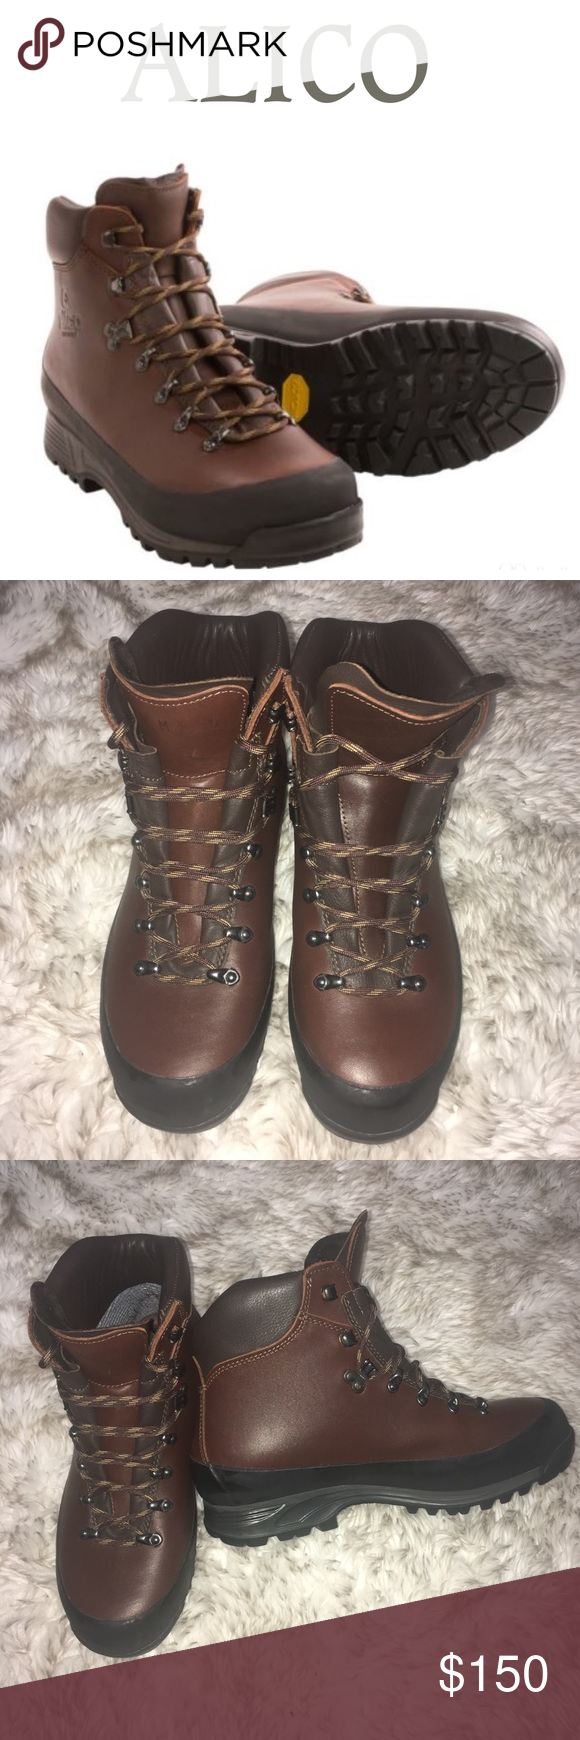 Alico Hiking Boots : alico, hiking, boots, Alico, Italy, Summit, Hiking, Boots, Leather, Alico's, Hik…, Boots,